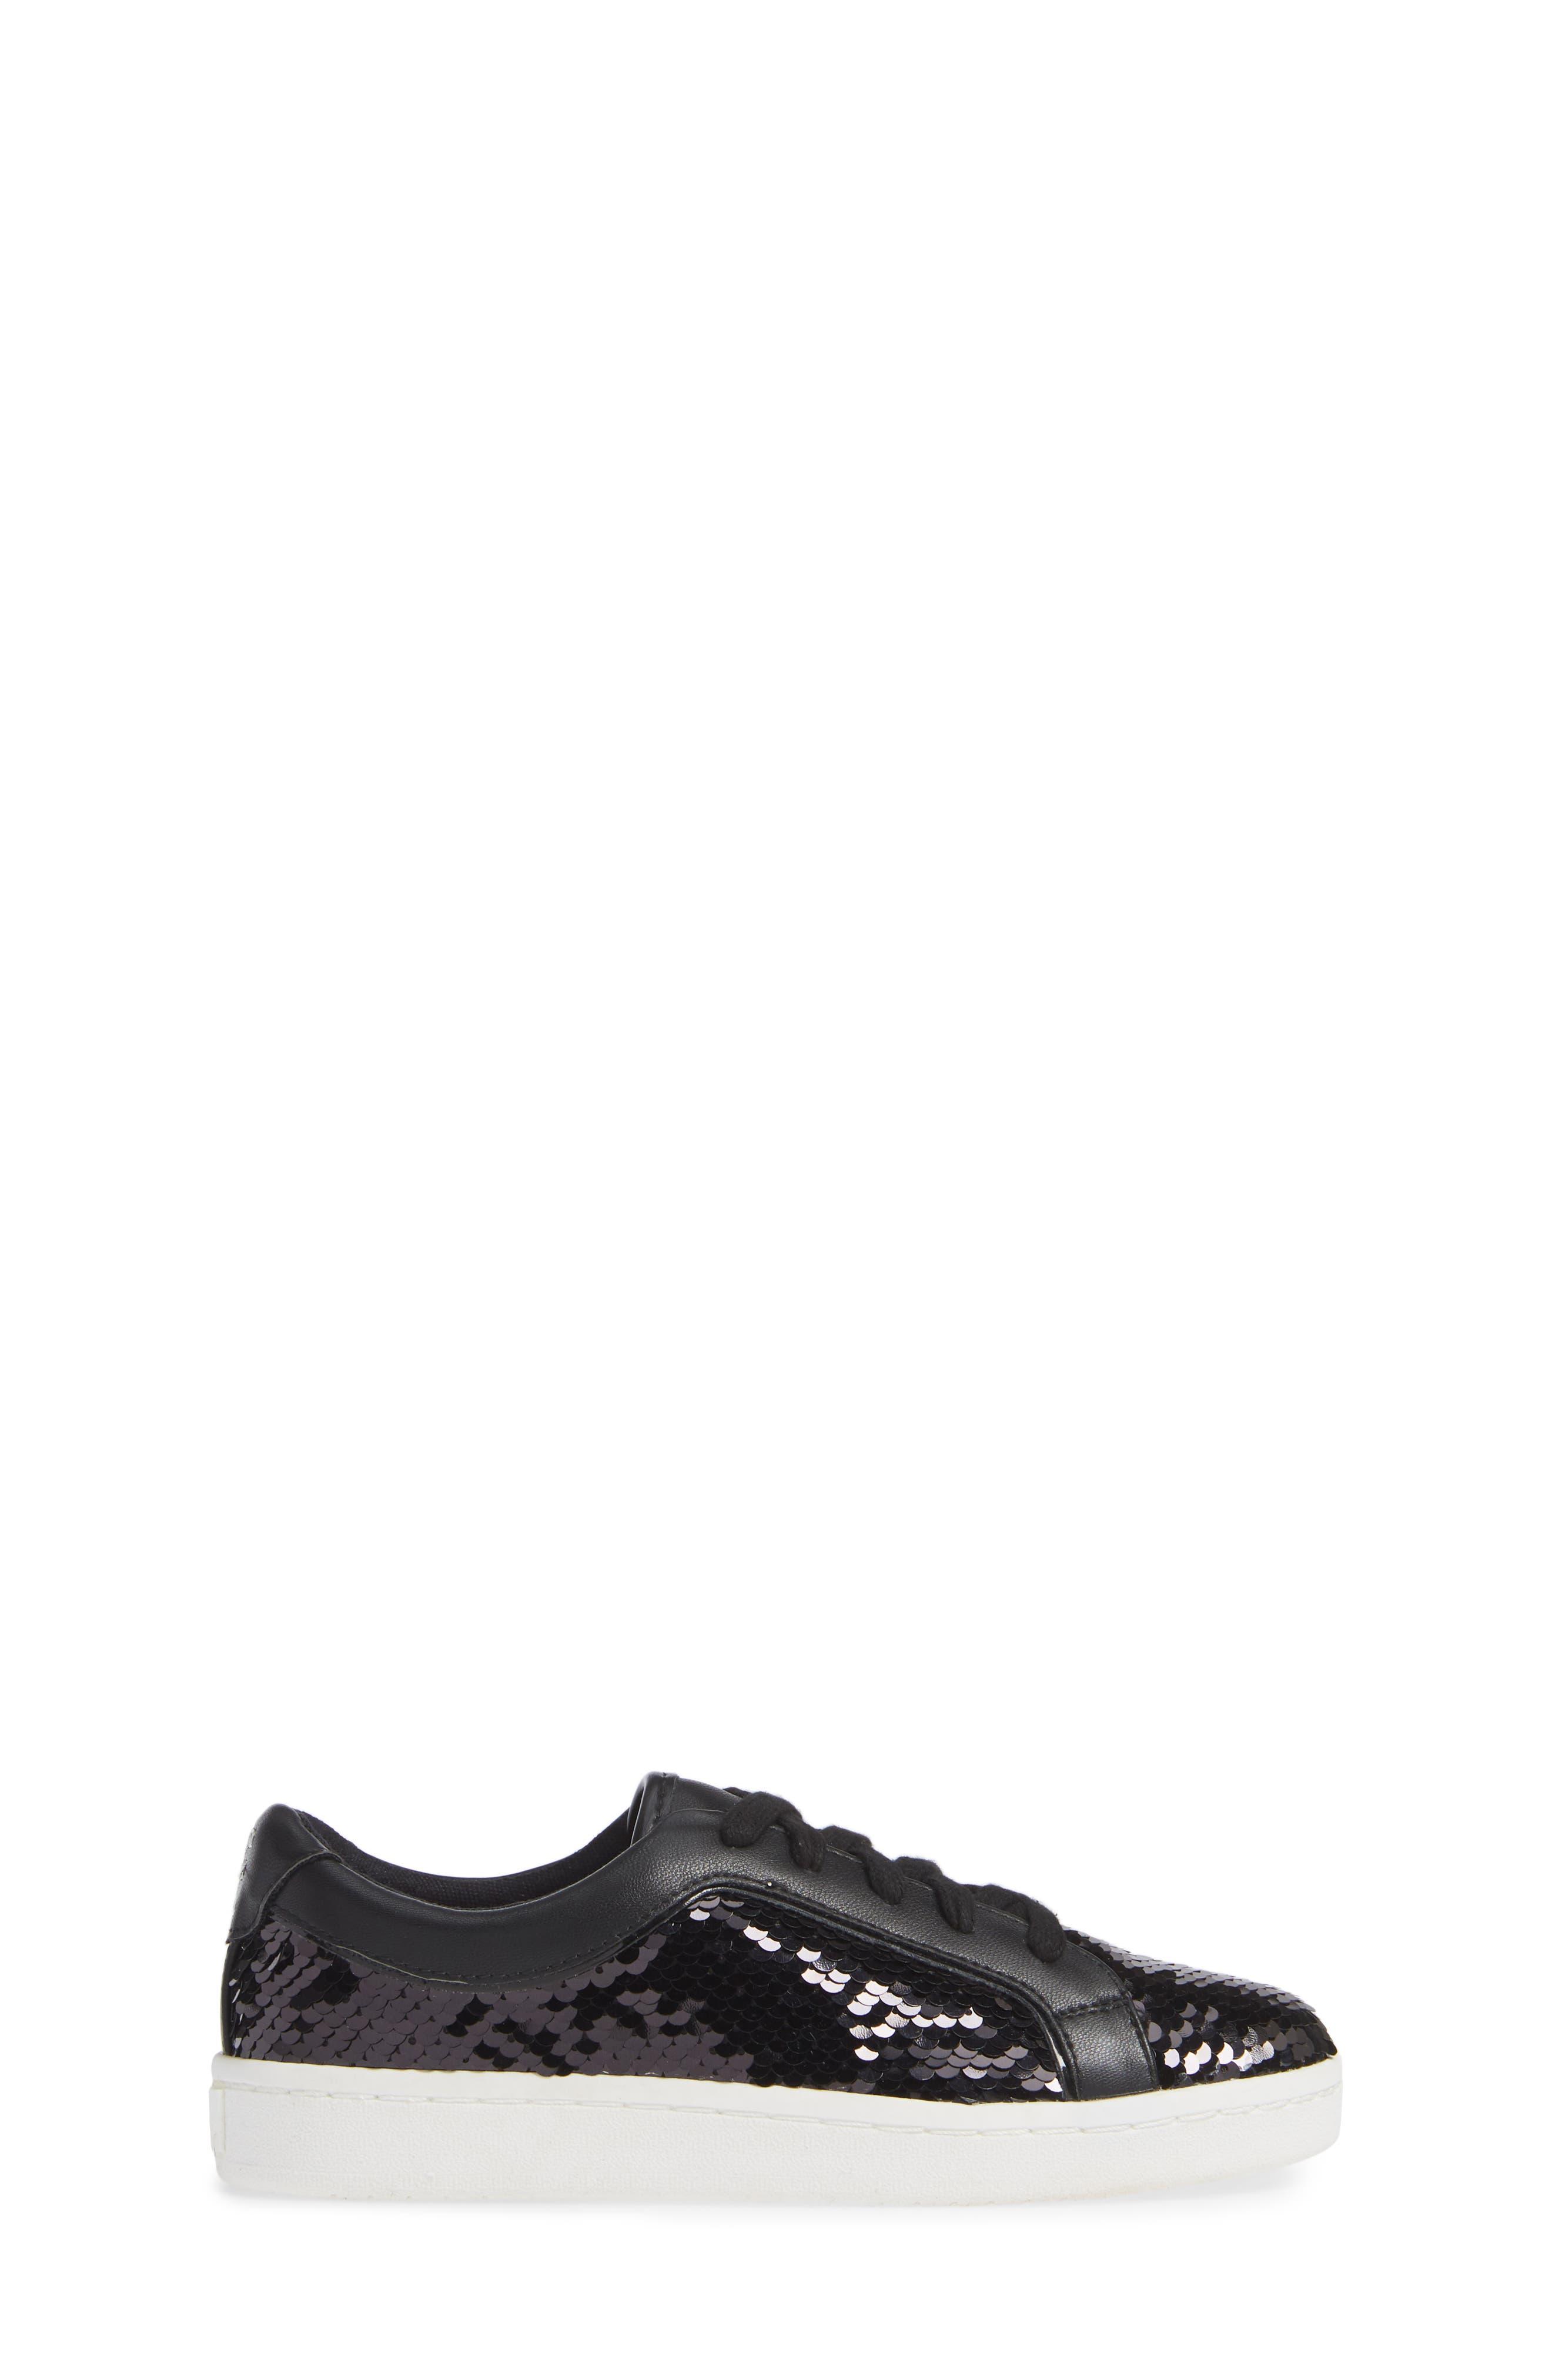 Blane Elizia Sequin Sneaker,                             Alternate thumbnail 3, color,                             BLACK SILVER